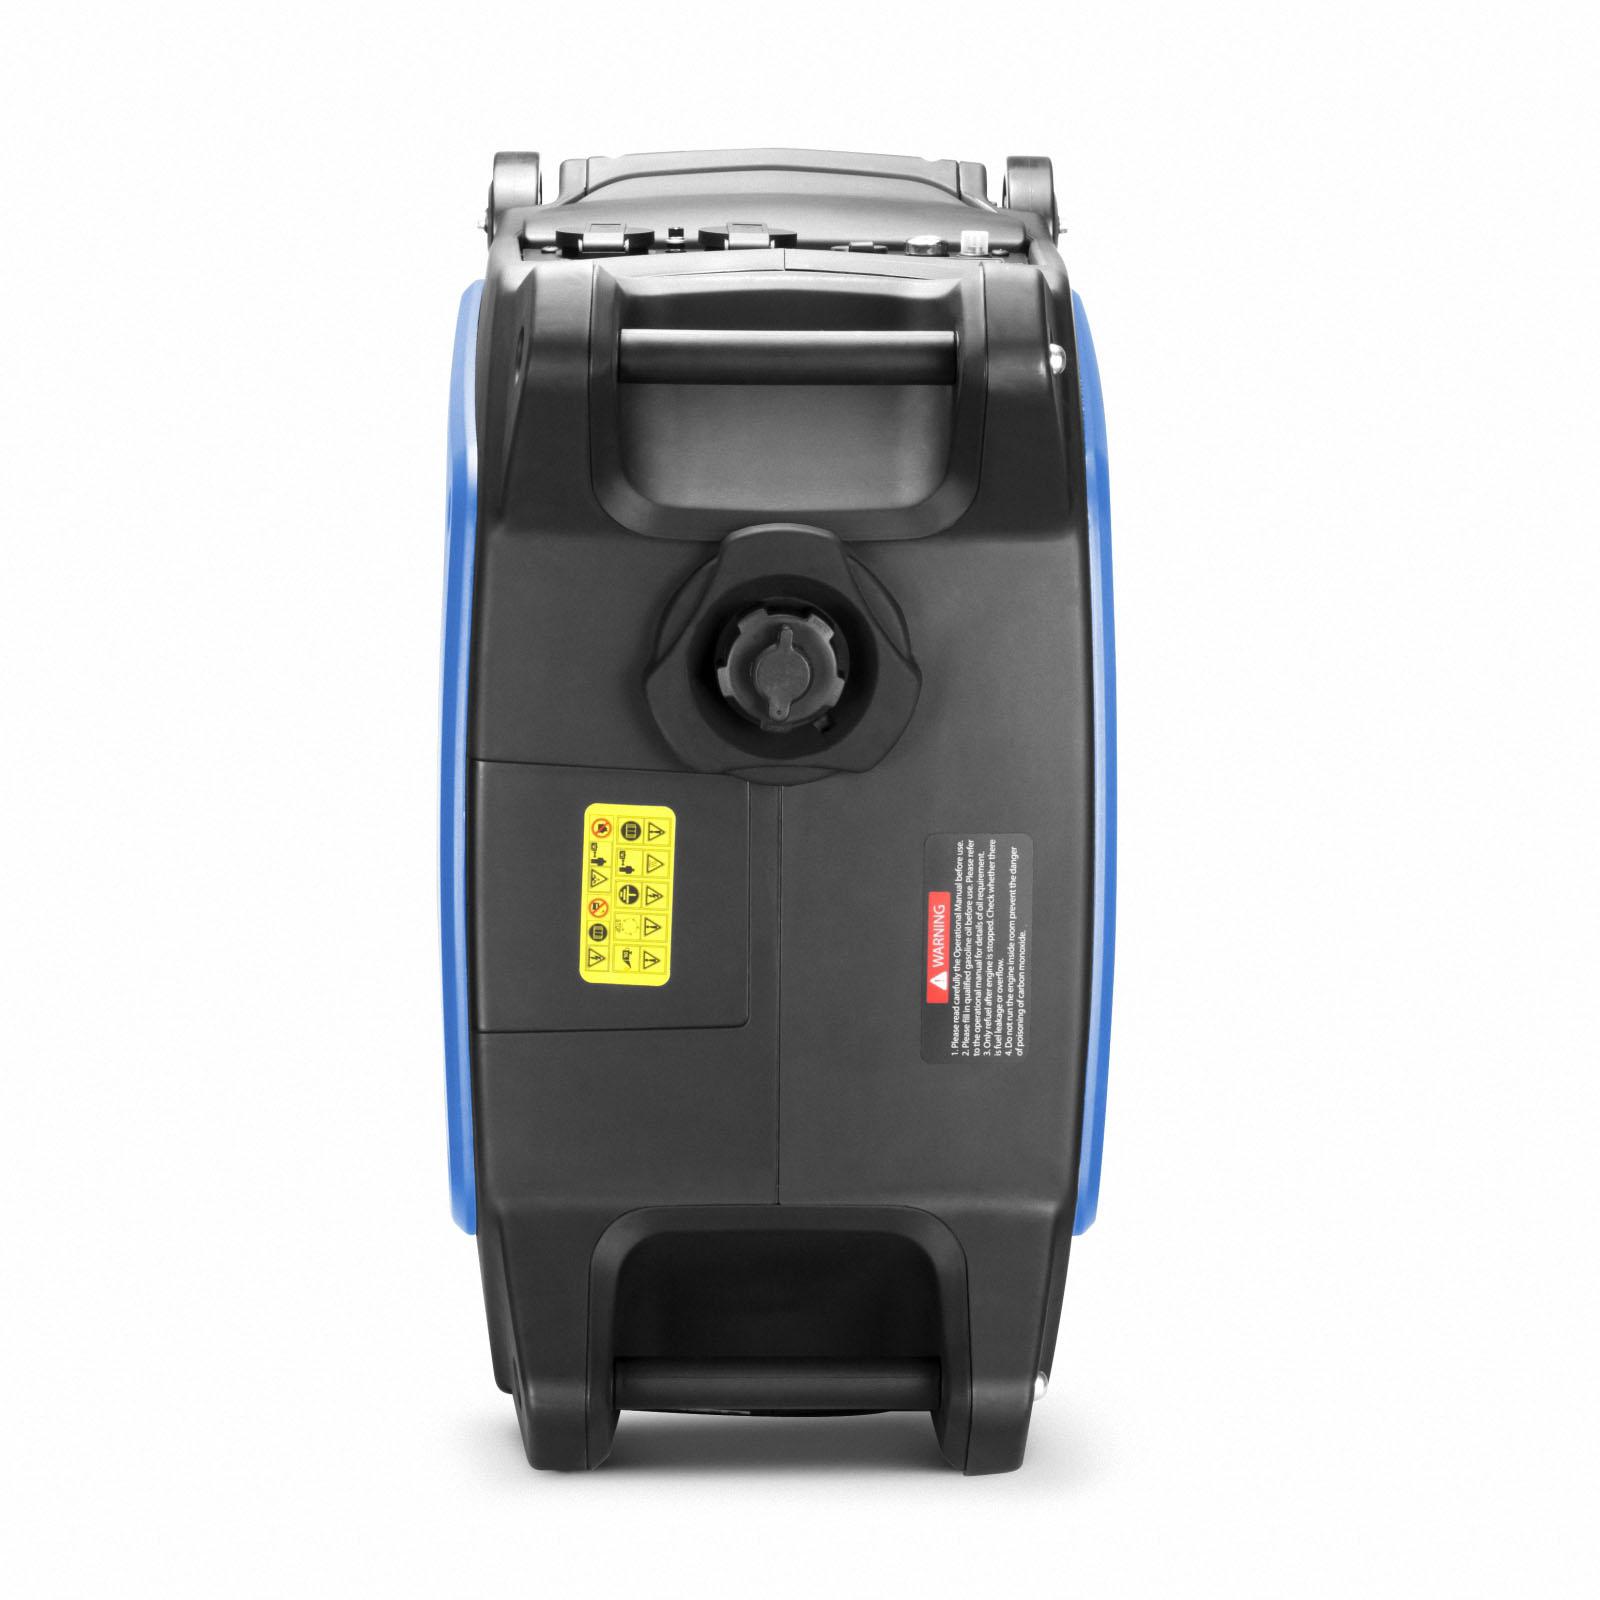 GenTrax Inverter Generator 3.5KW Max 12v Remote Start Portable Petrol Camping 6